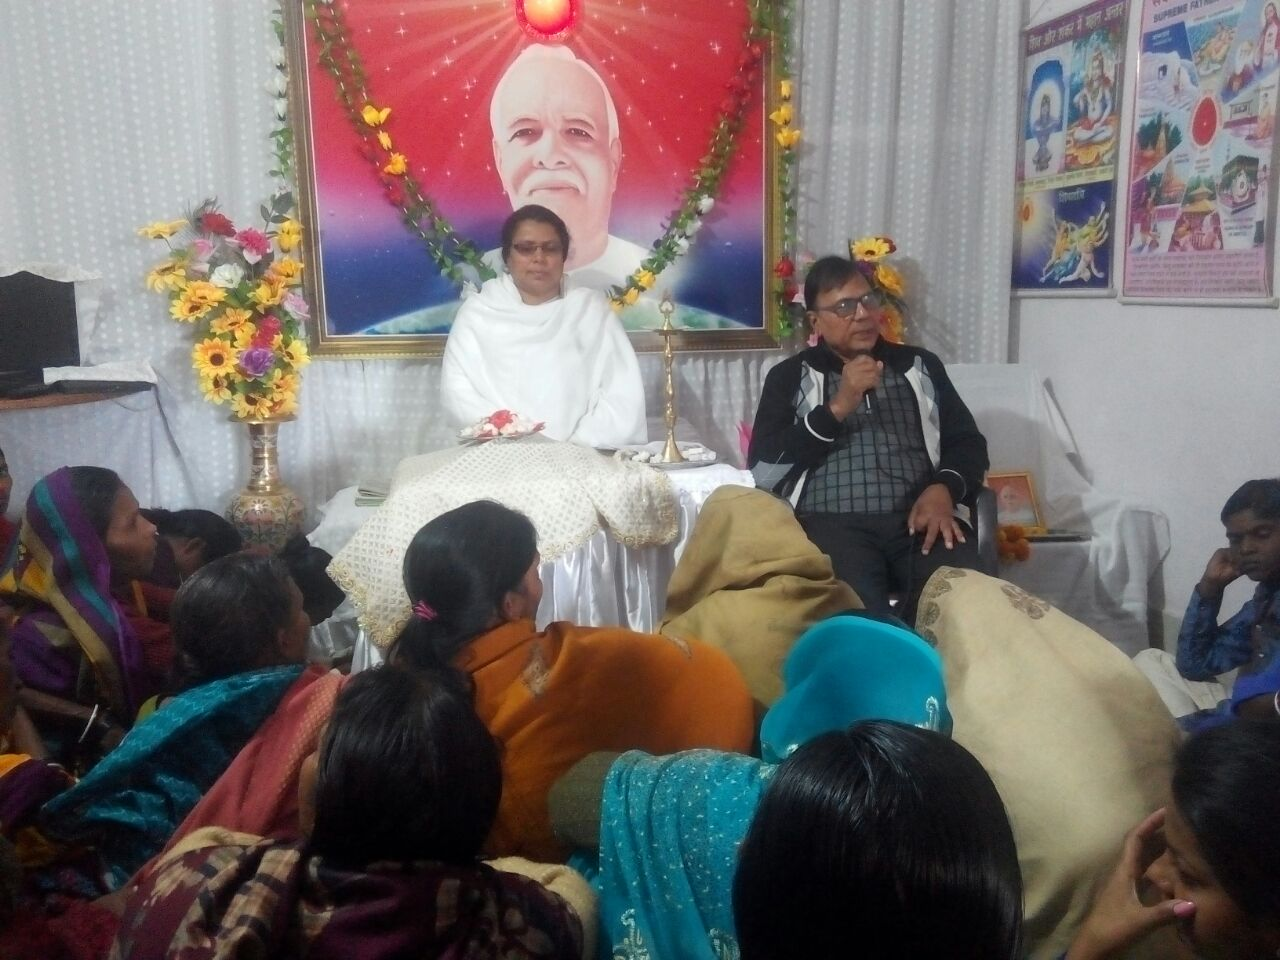 Dr.Madhepuri addressing the devotees after  inaugurating the function at Prajapita Brahma Kumari Madhepura .